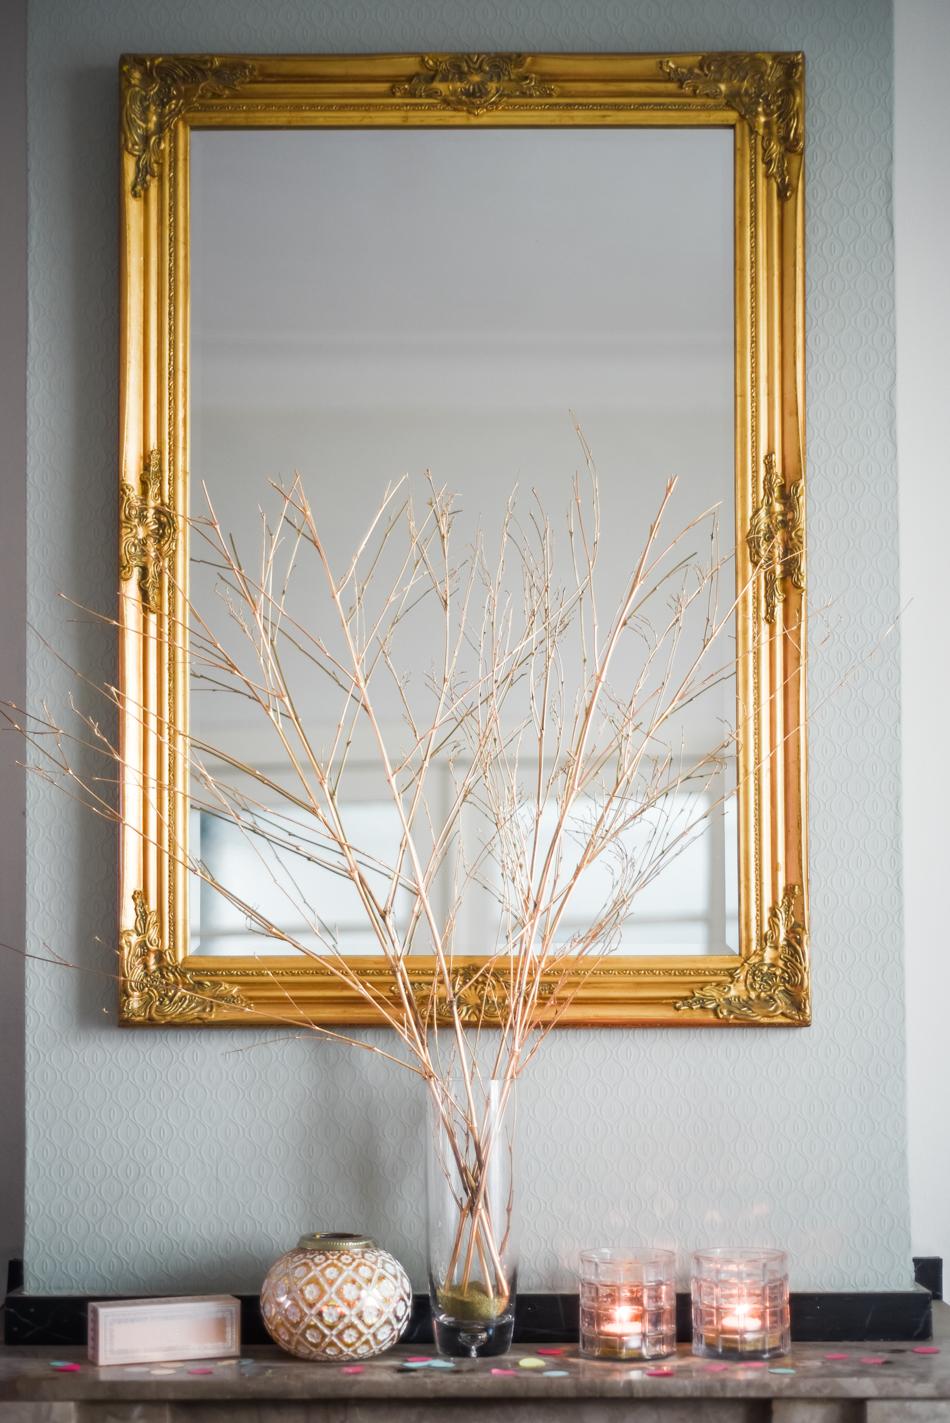 Valentinesday-table-setting-decor-styling-AnaisStoelen-19.jpg